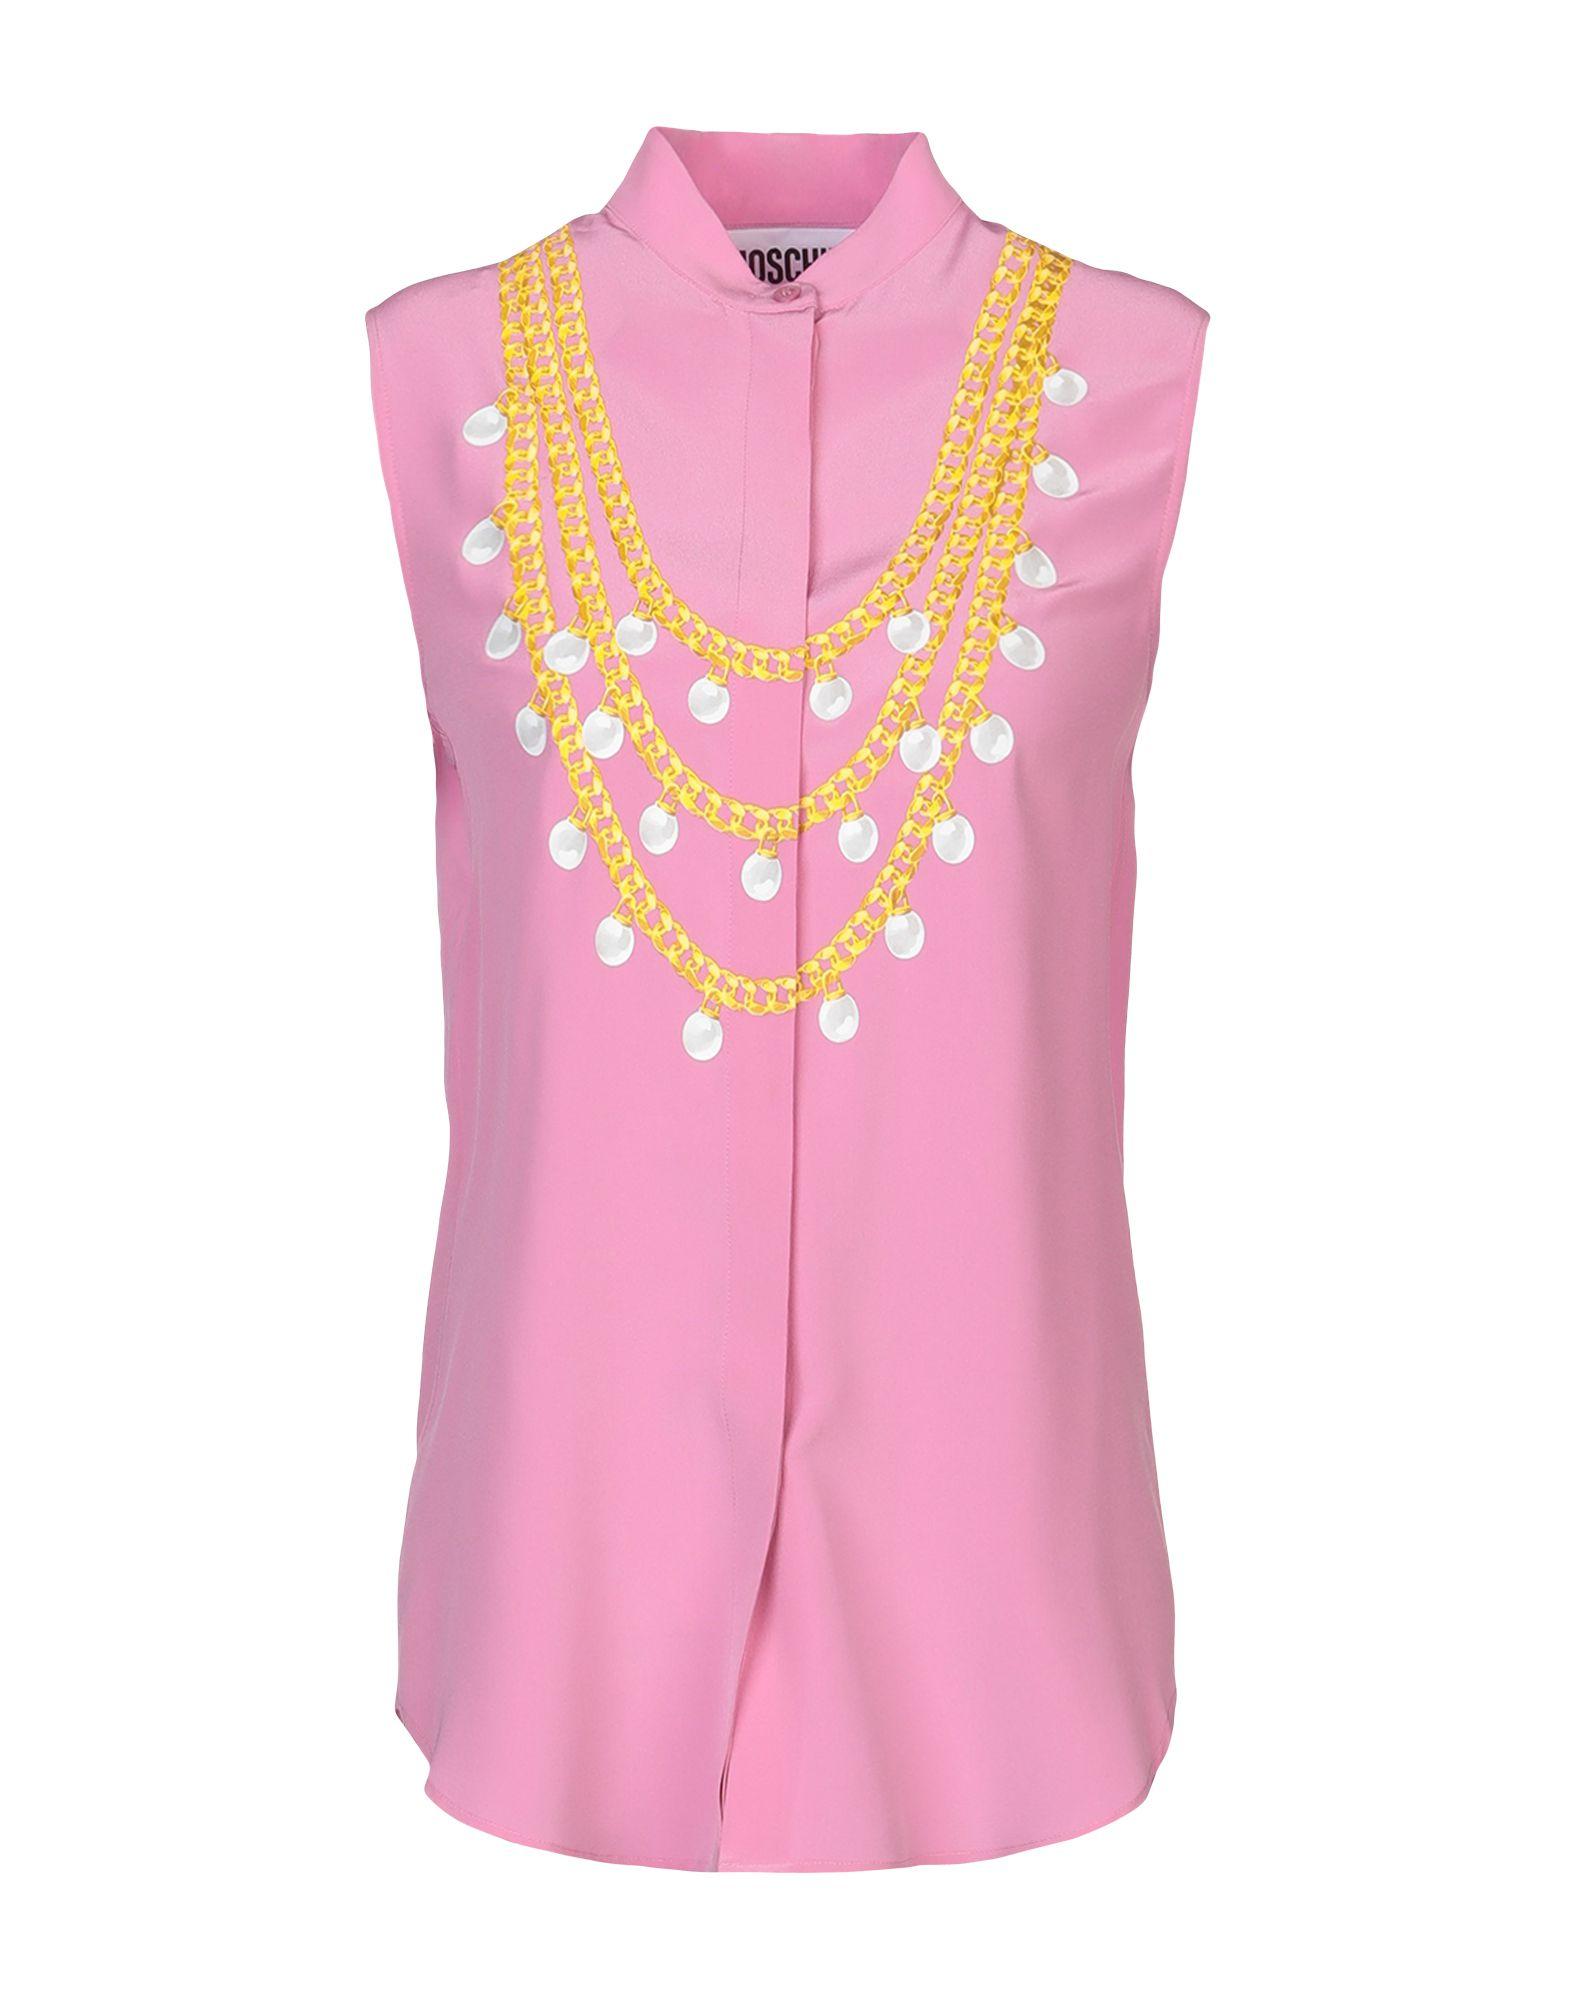 Camicie E bluse In Seta Mos Mos no donna - 38815694MS